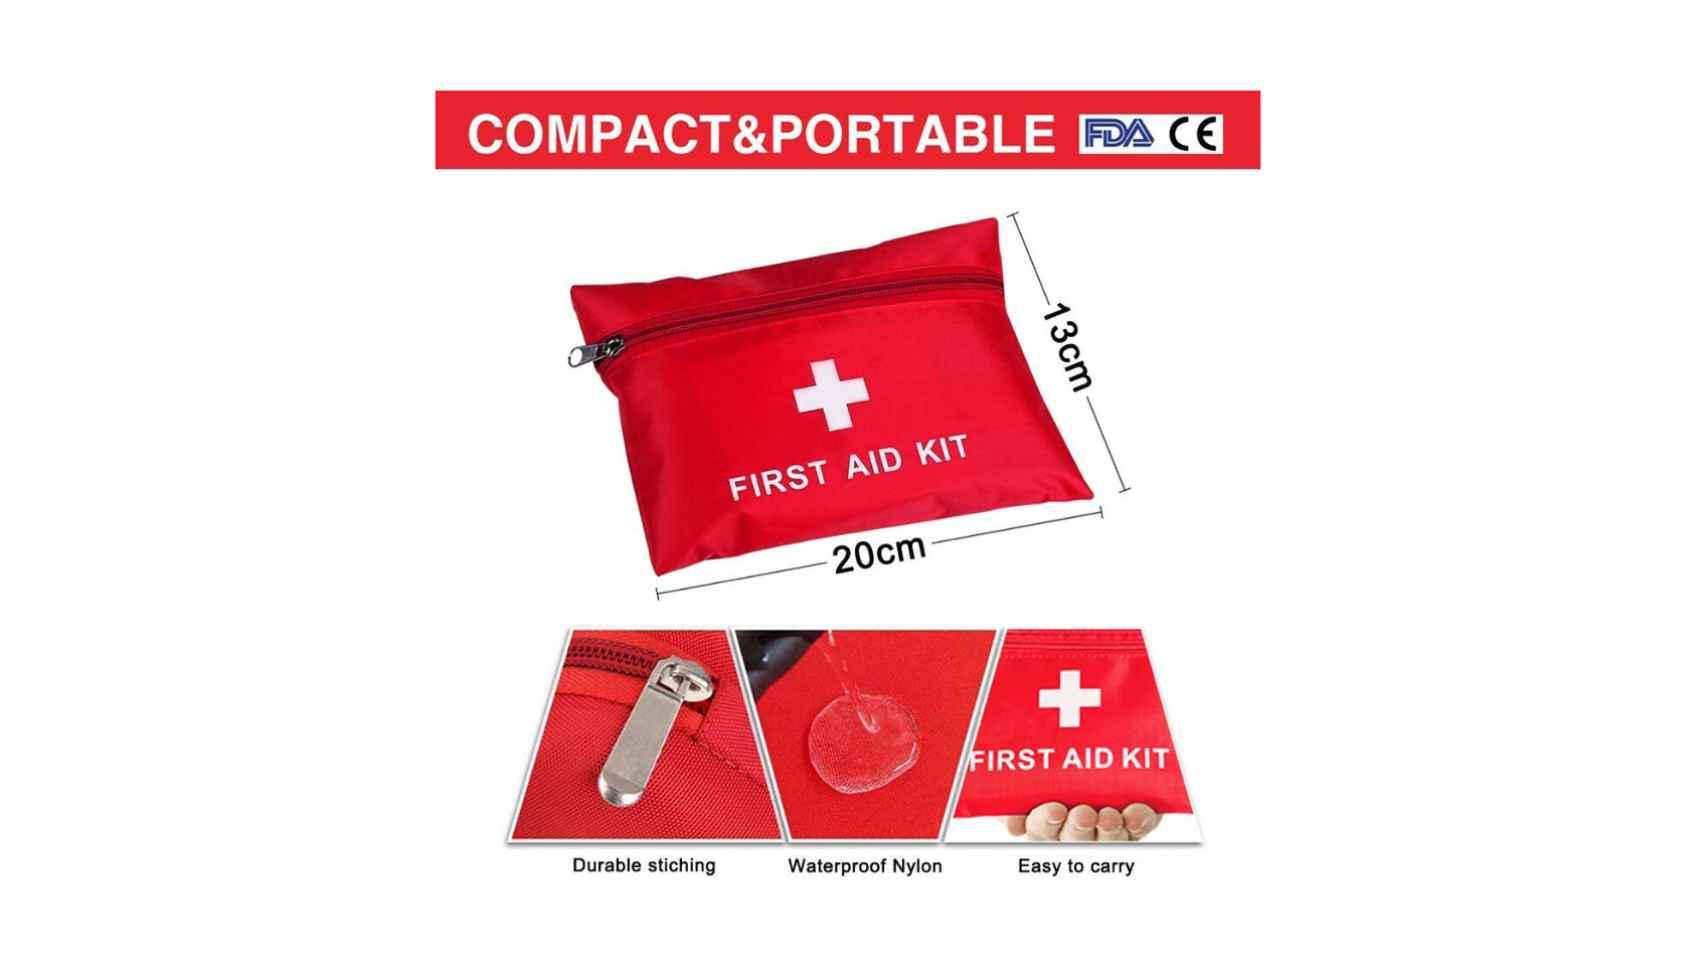 Kit de emergencia